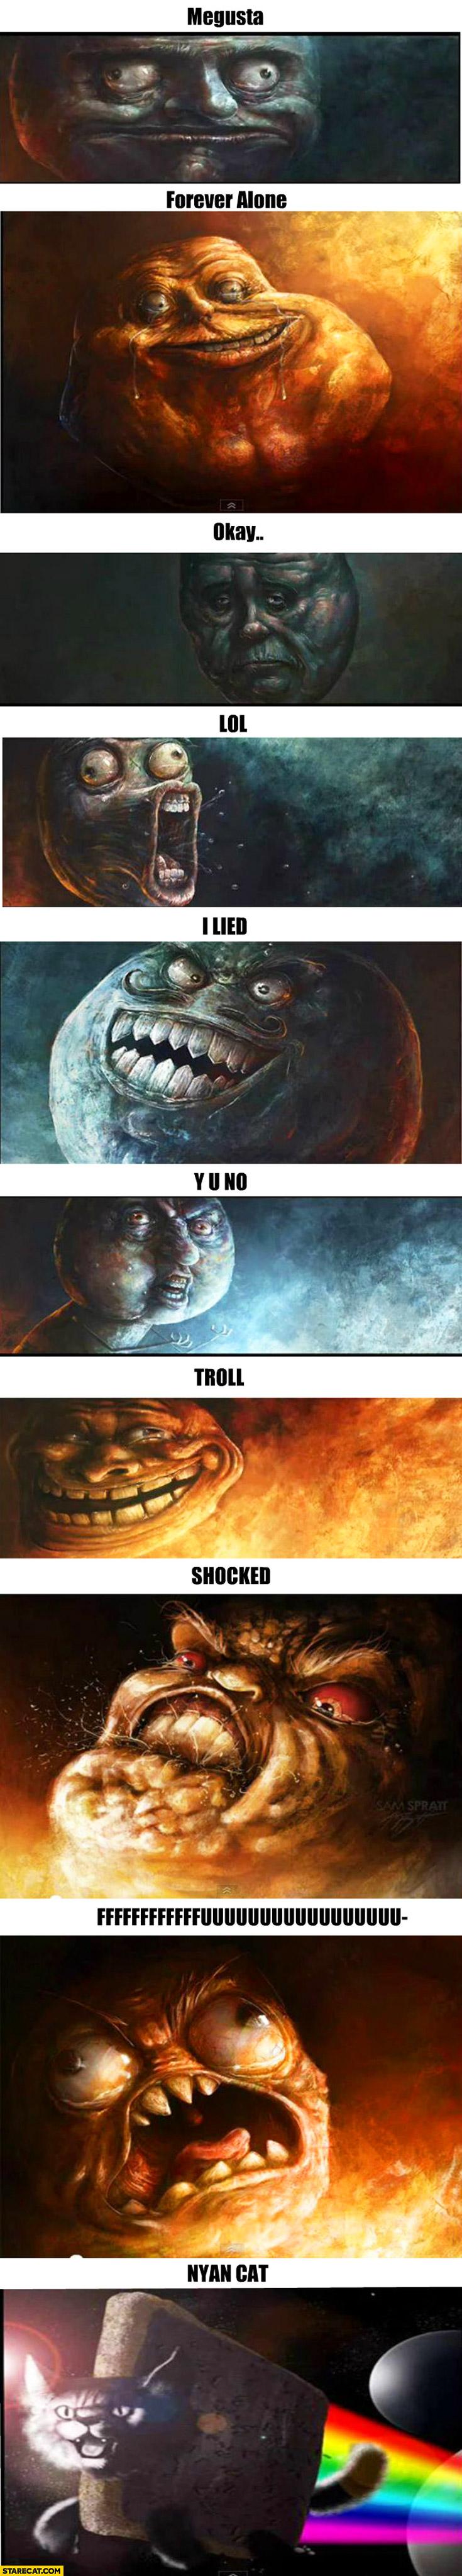 10 realistic memes megusta forever alone